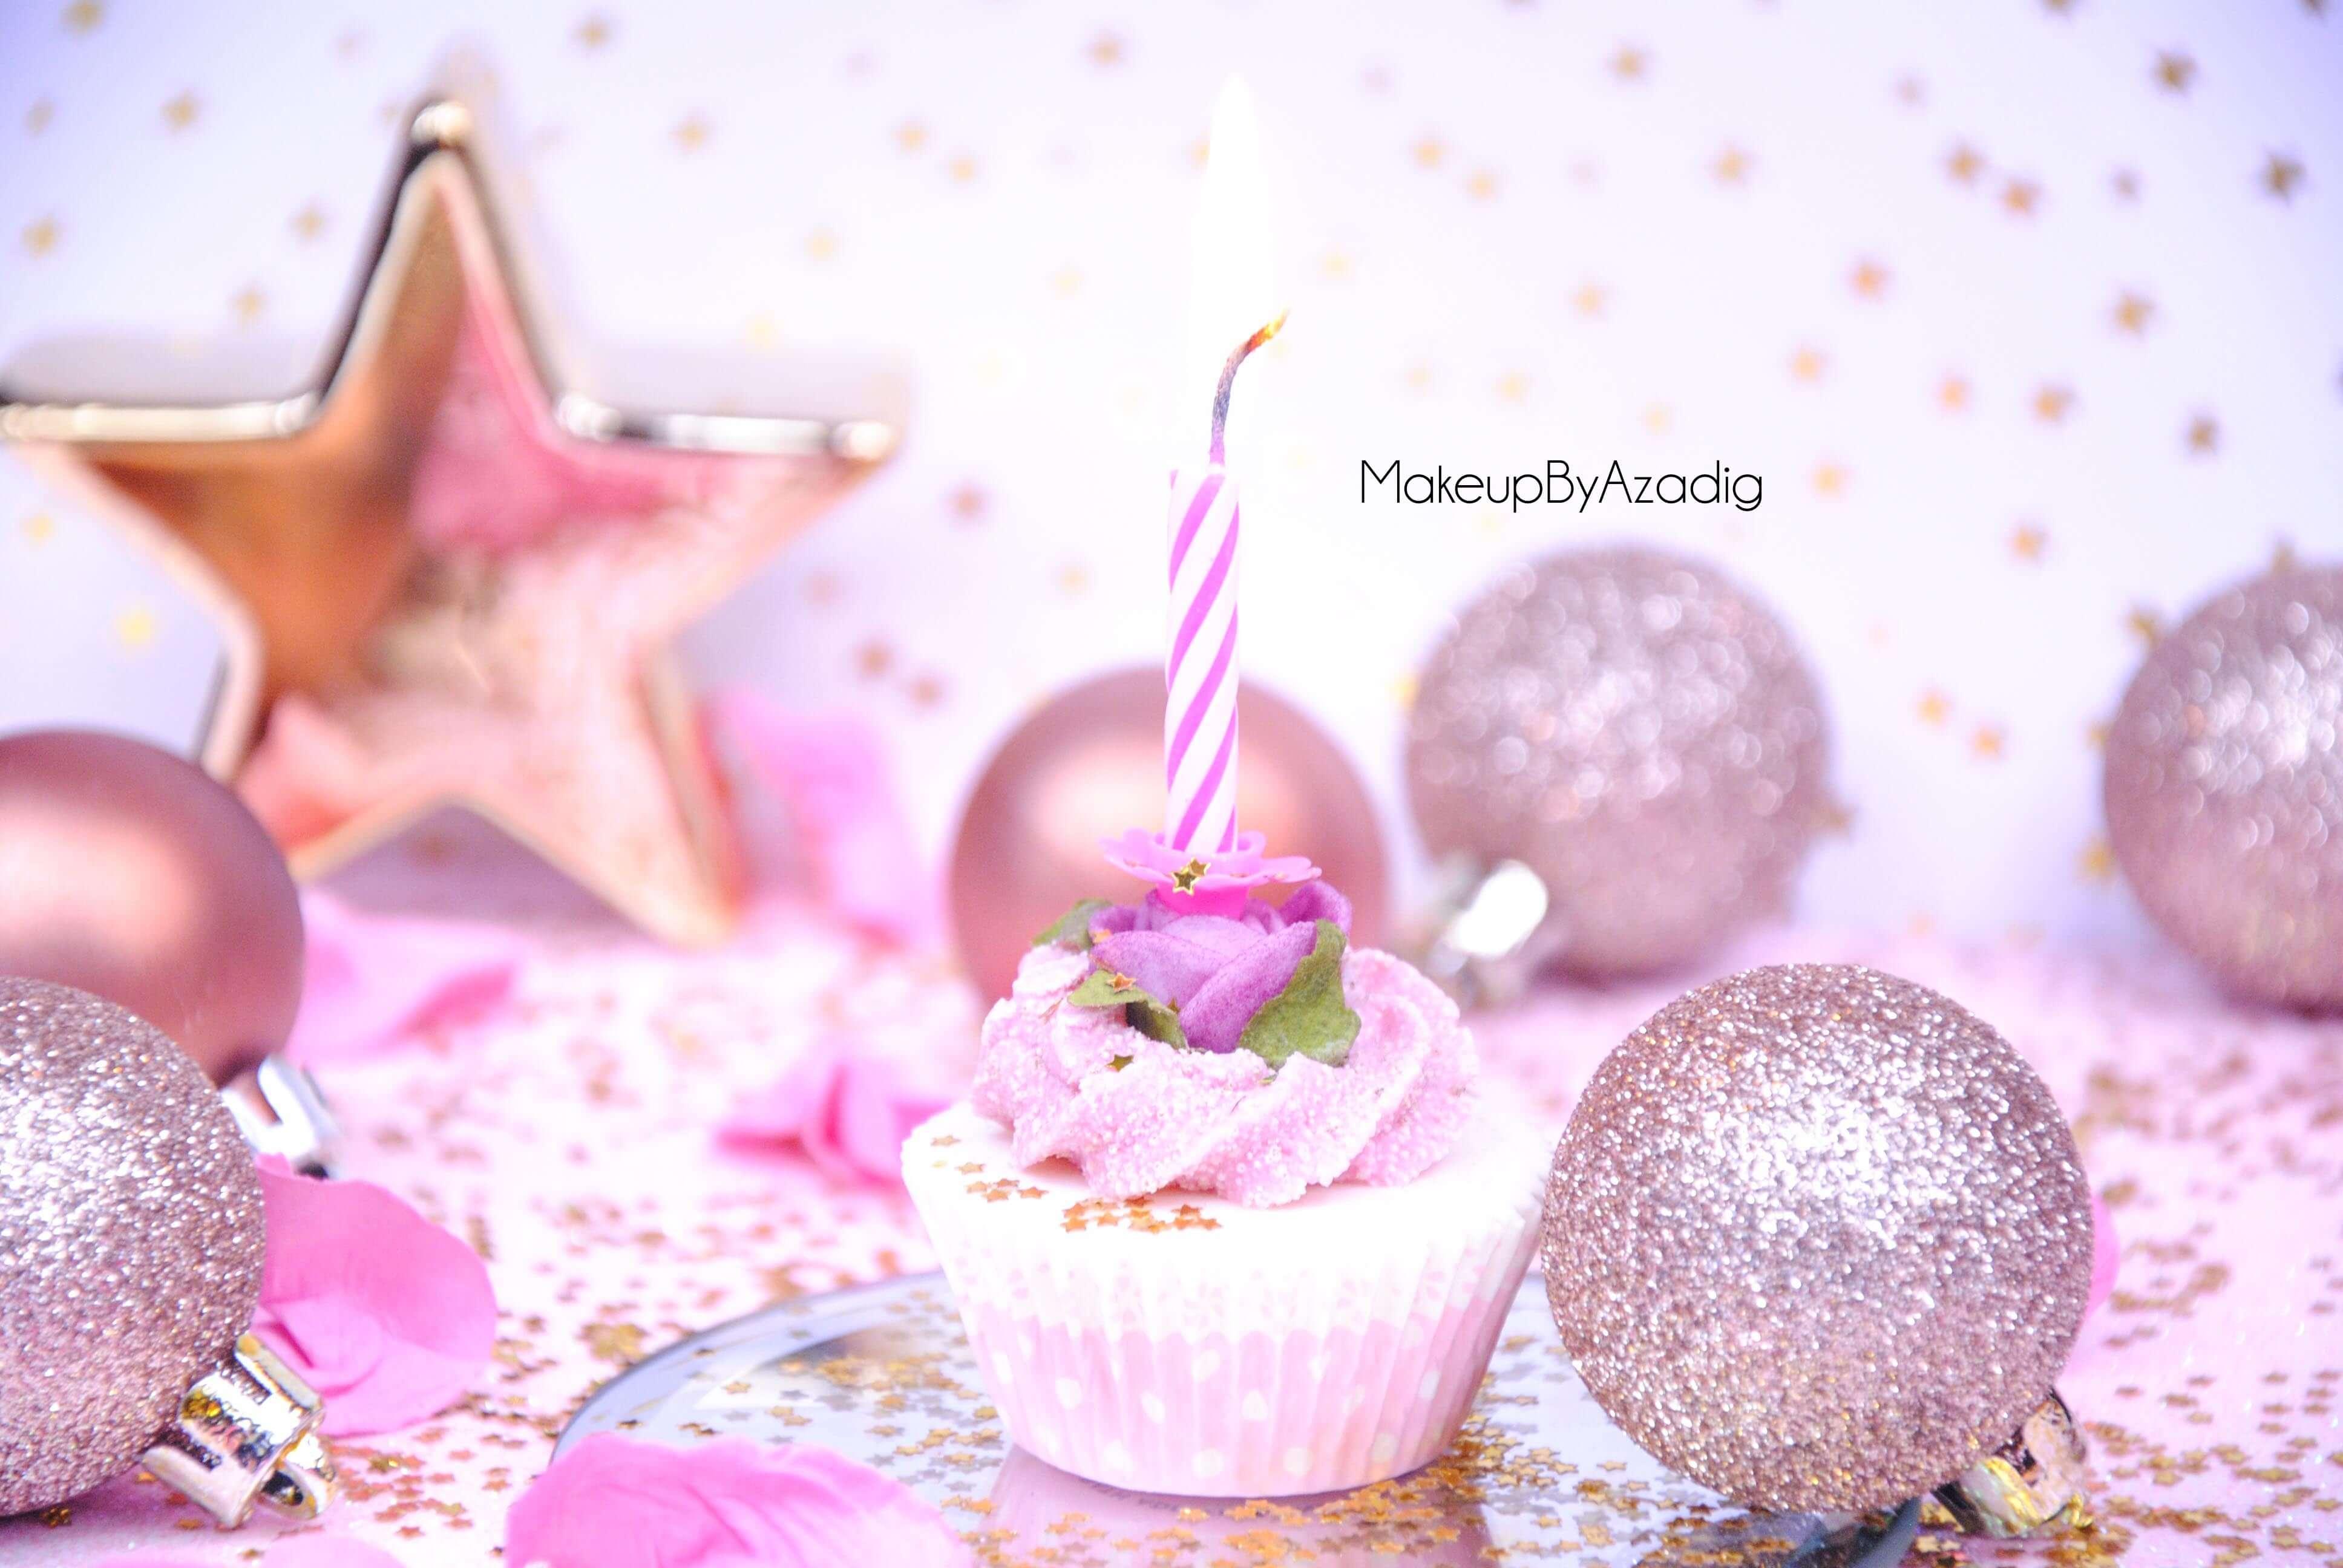 stars-makeupbyazadig-joyeux-blog-anniversaire-influencer-troyes-paris-love